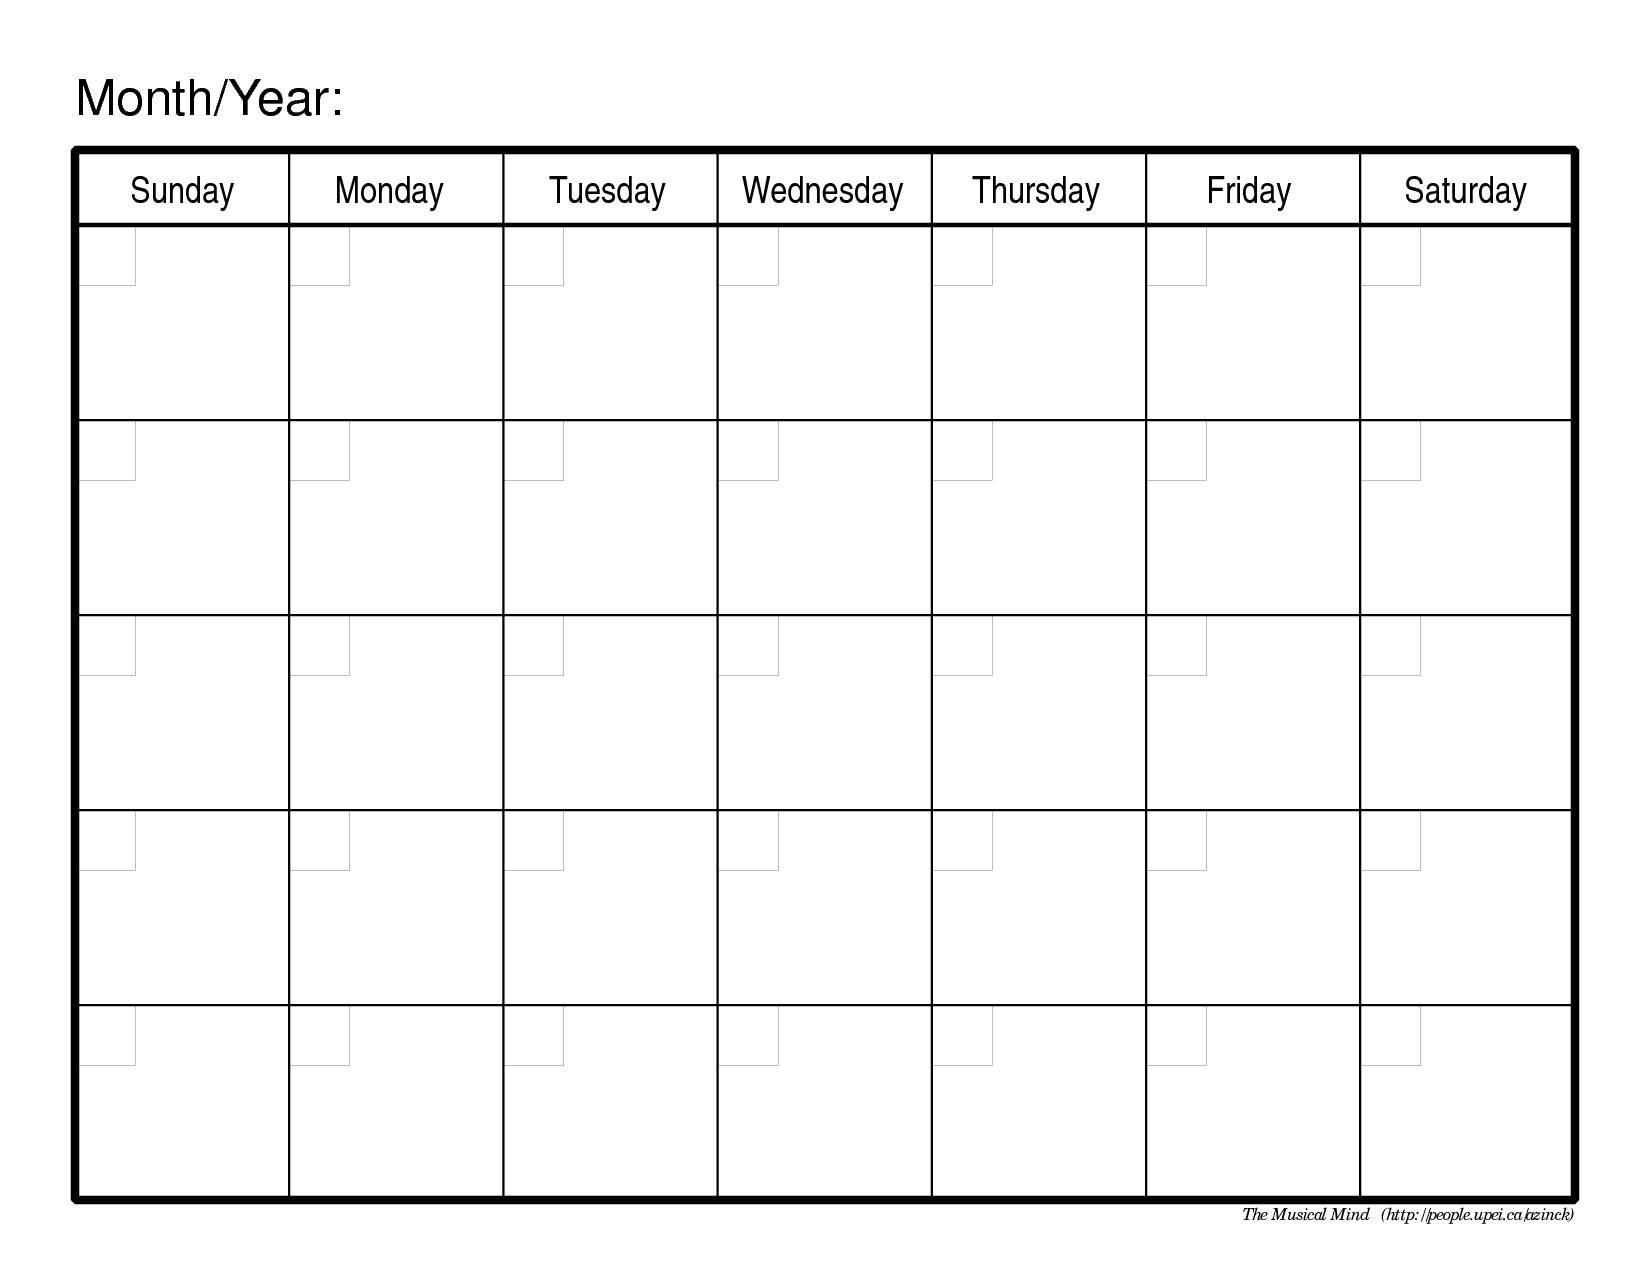 Calendar Template Print Outs Monthly Calendar Print Out Print intended for Calendar By Month To Print